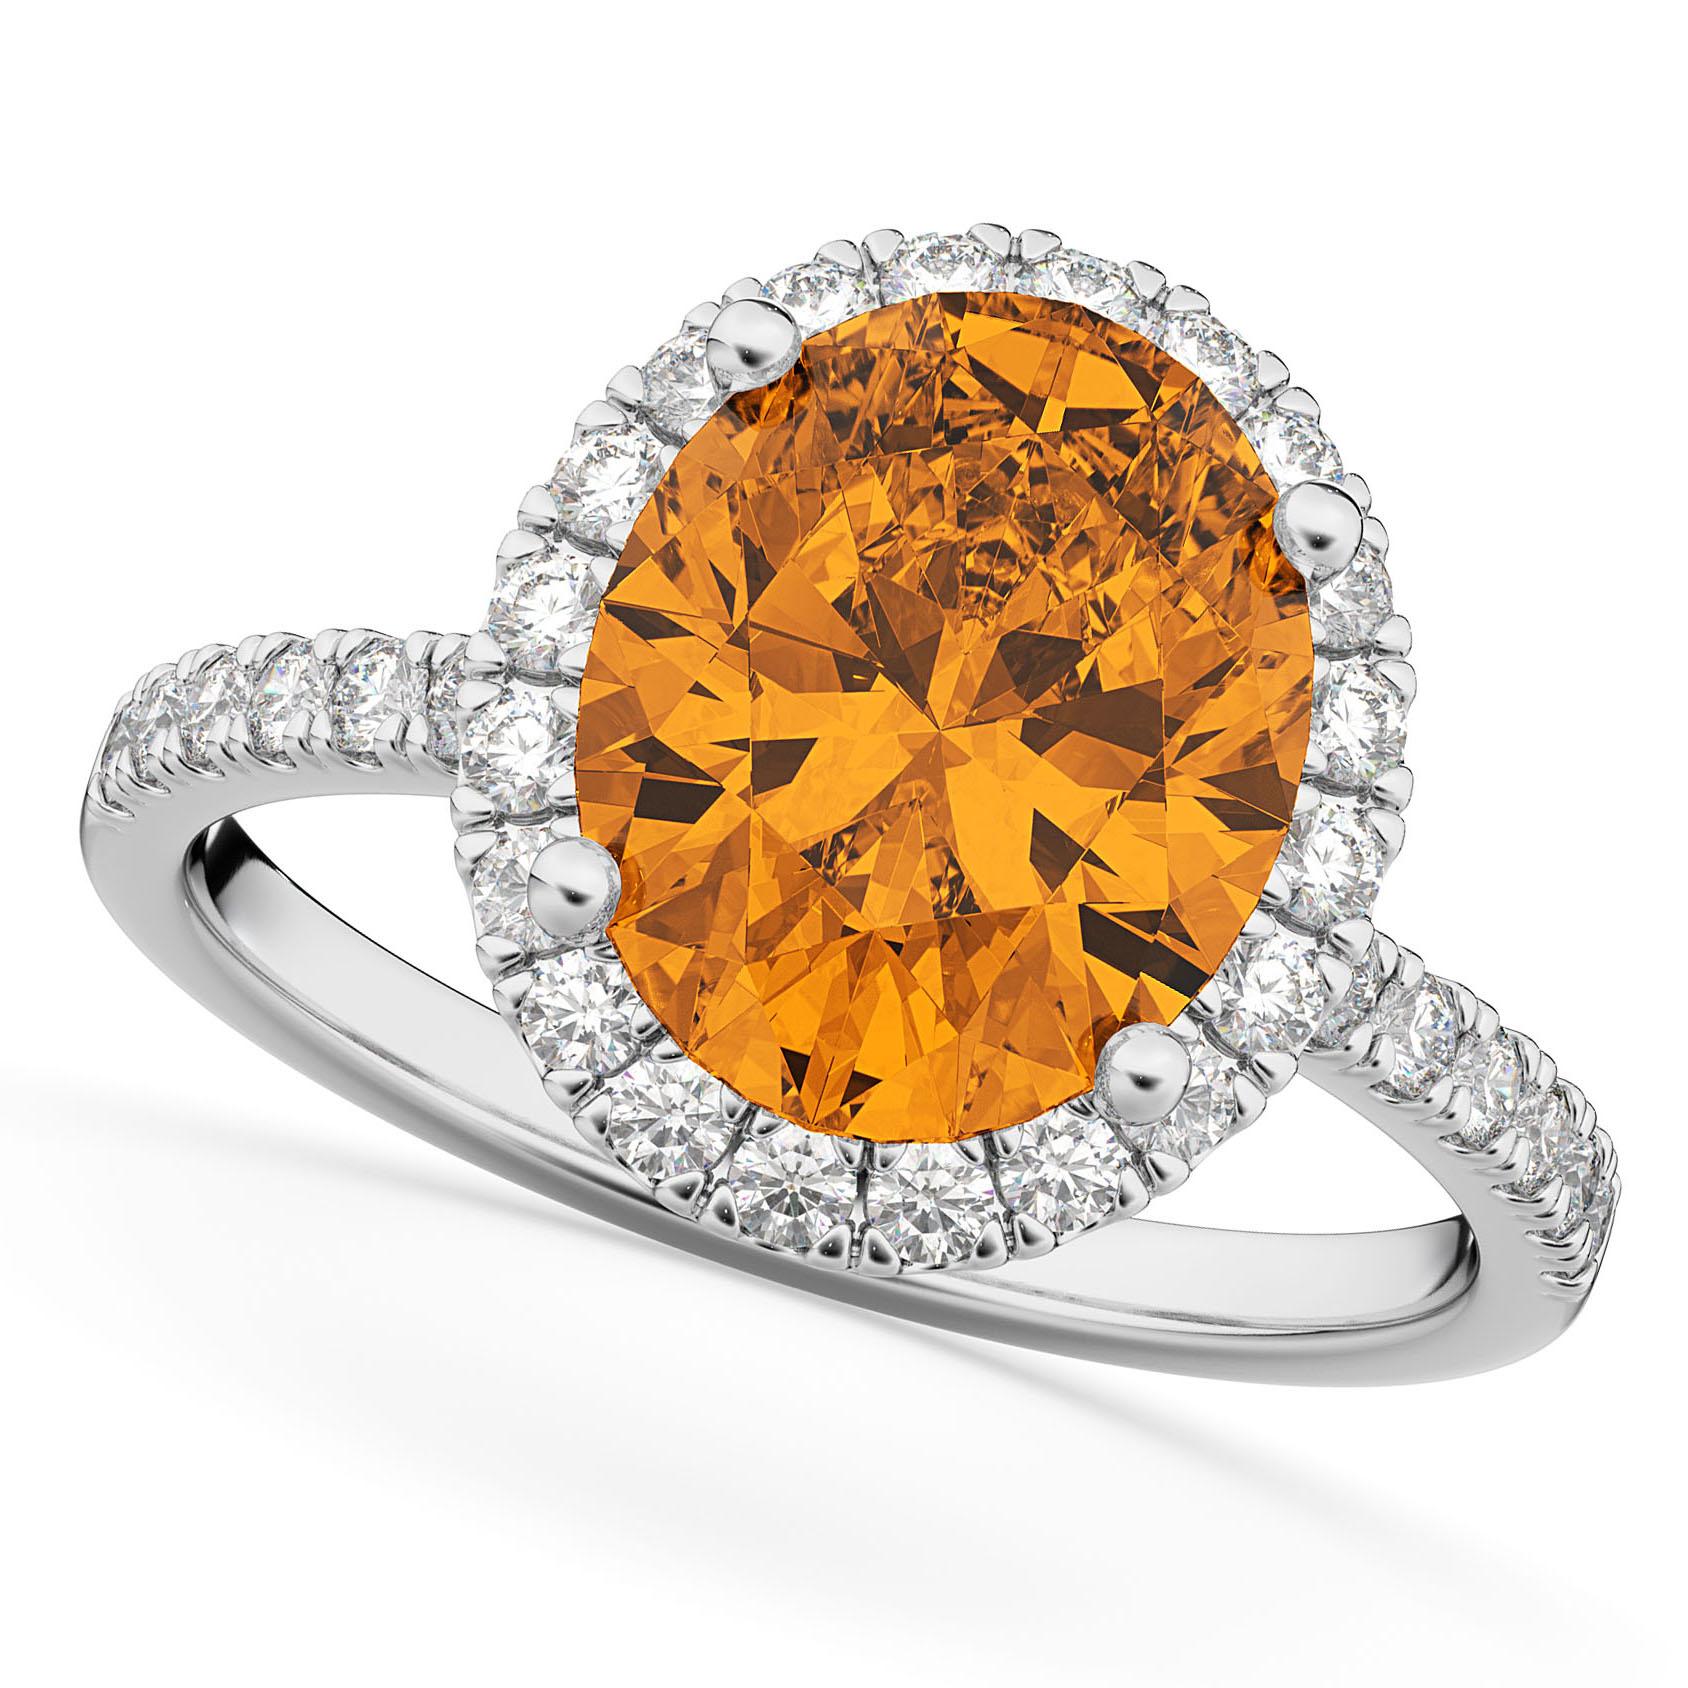 Oval Cut Halo Citrine & Diamond Engagement Ring 14K White Gold 2.91ct